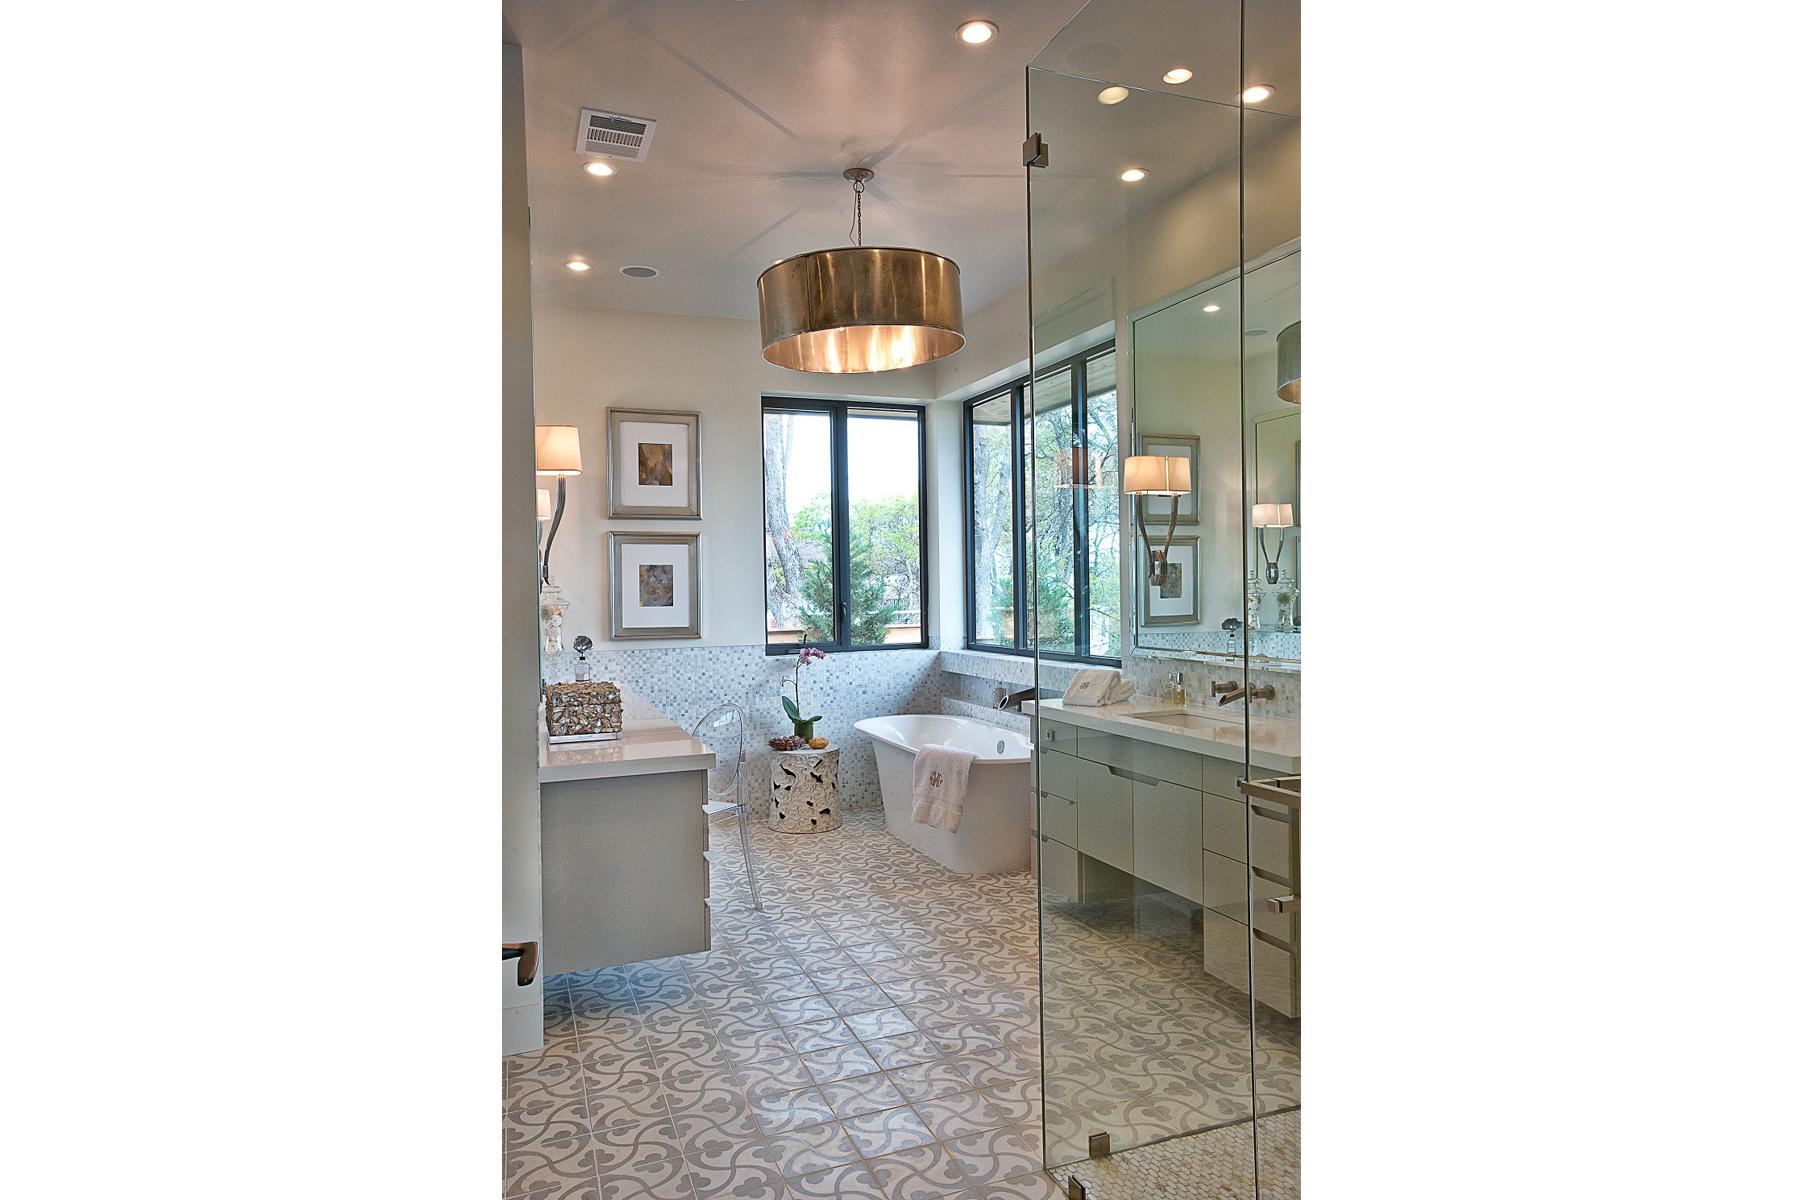 CatMountain-master-bathroom